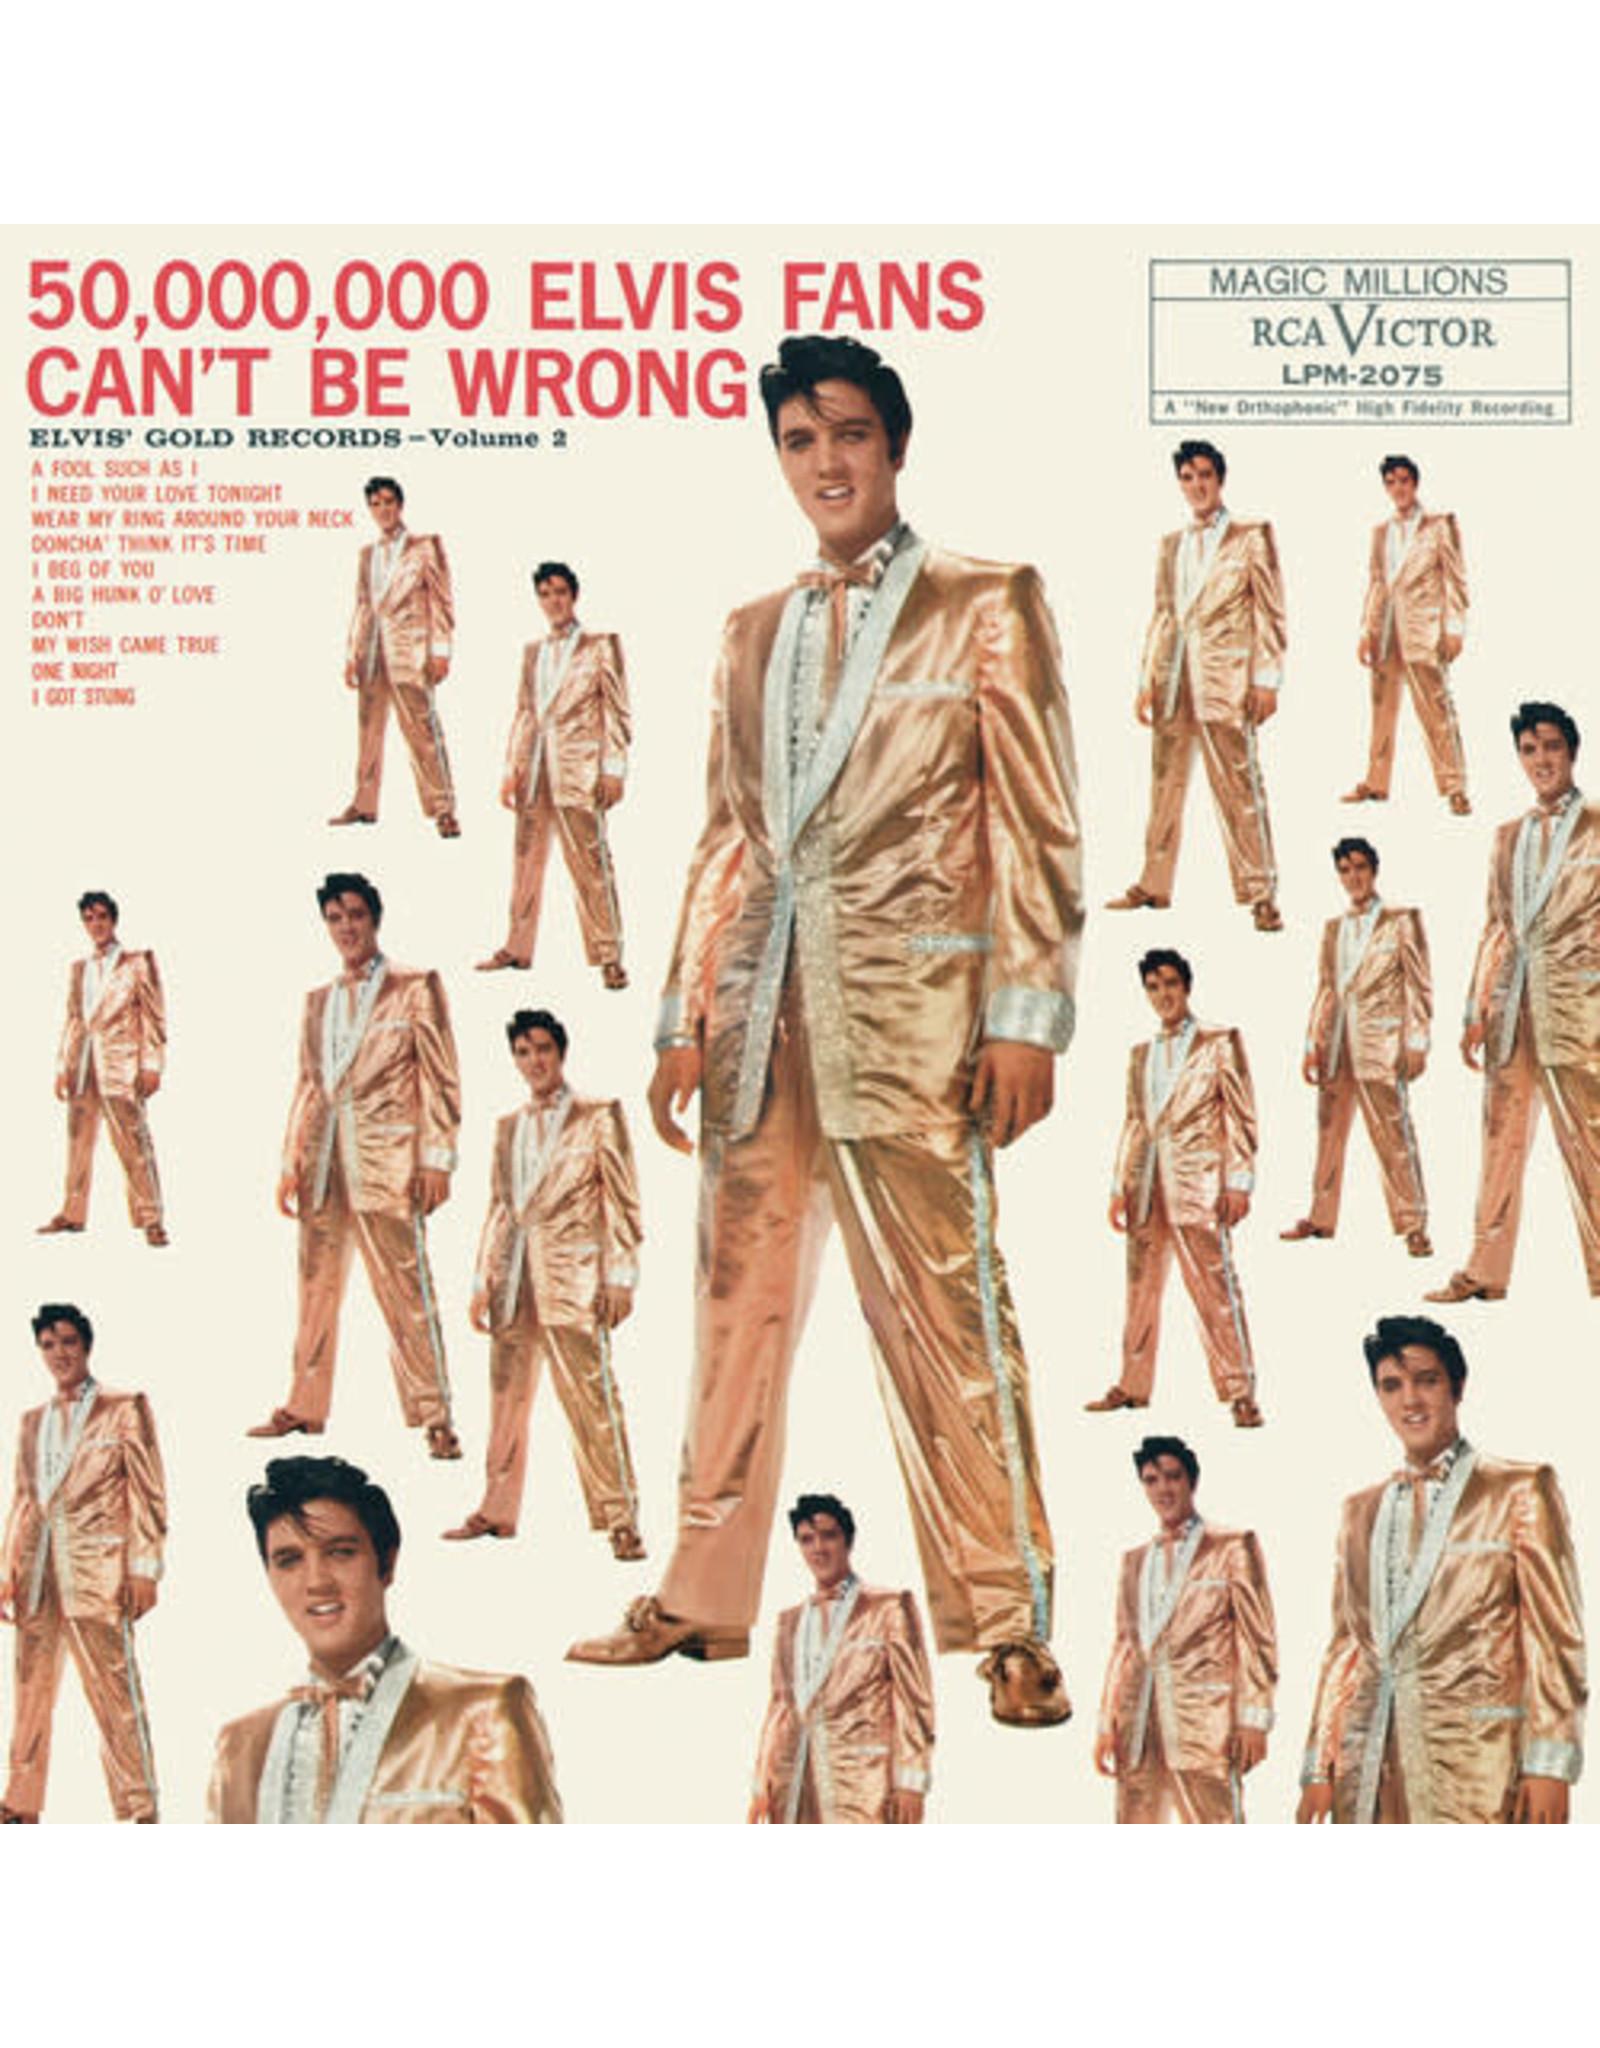 New Vinyl Elvis Presley - 50,000,000 Elvis Fans Can't Be Wrong: Elvis' Gold Records Vol. 2